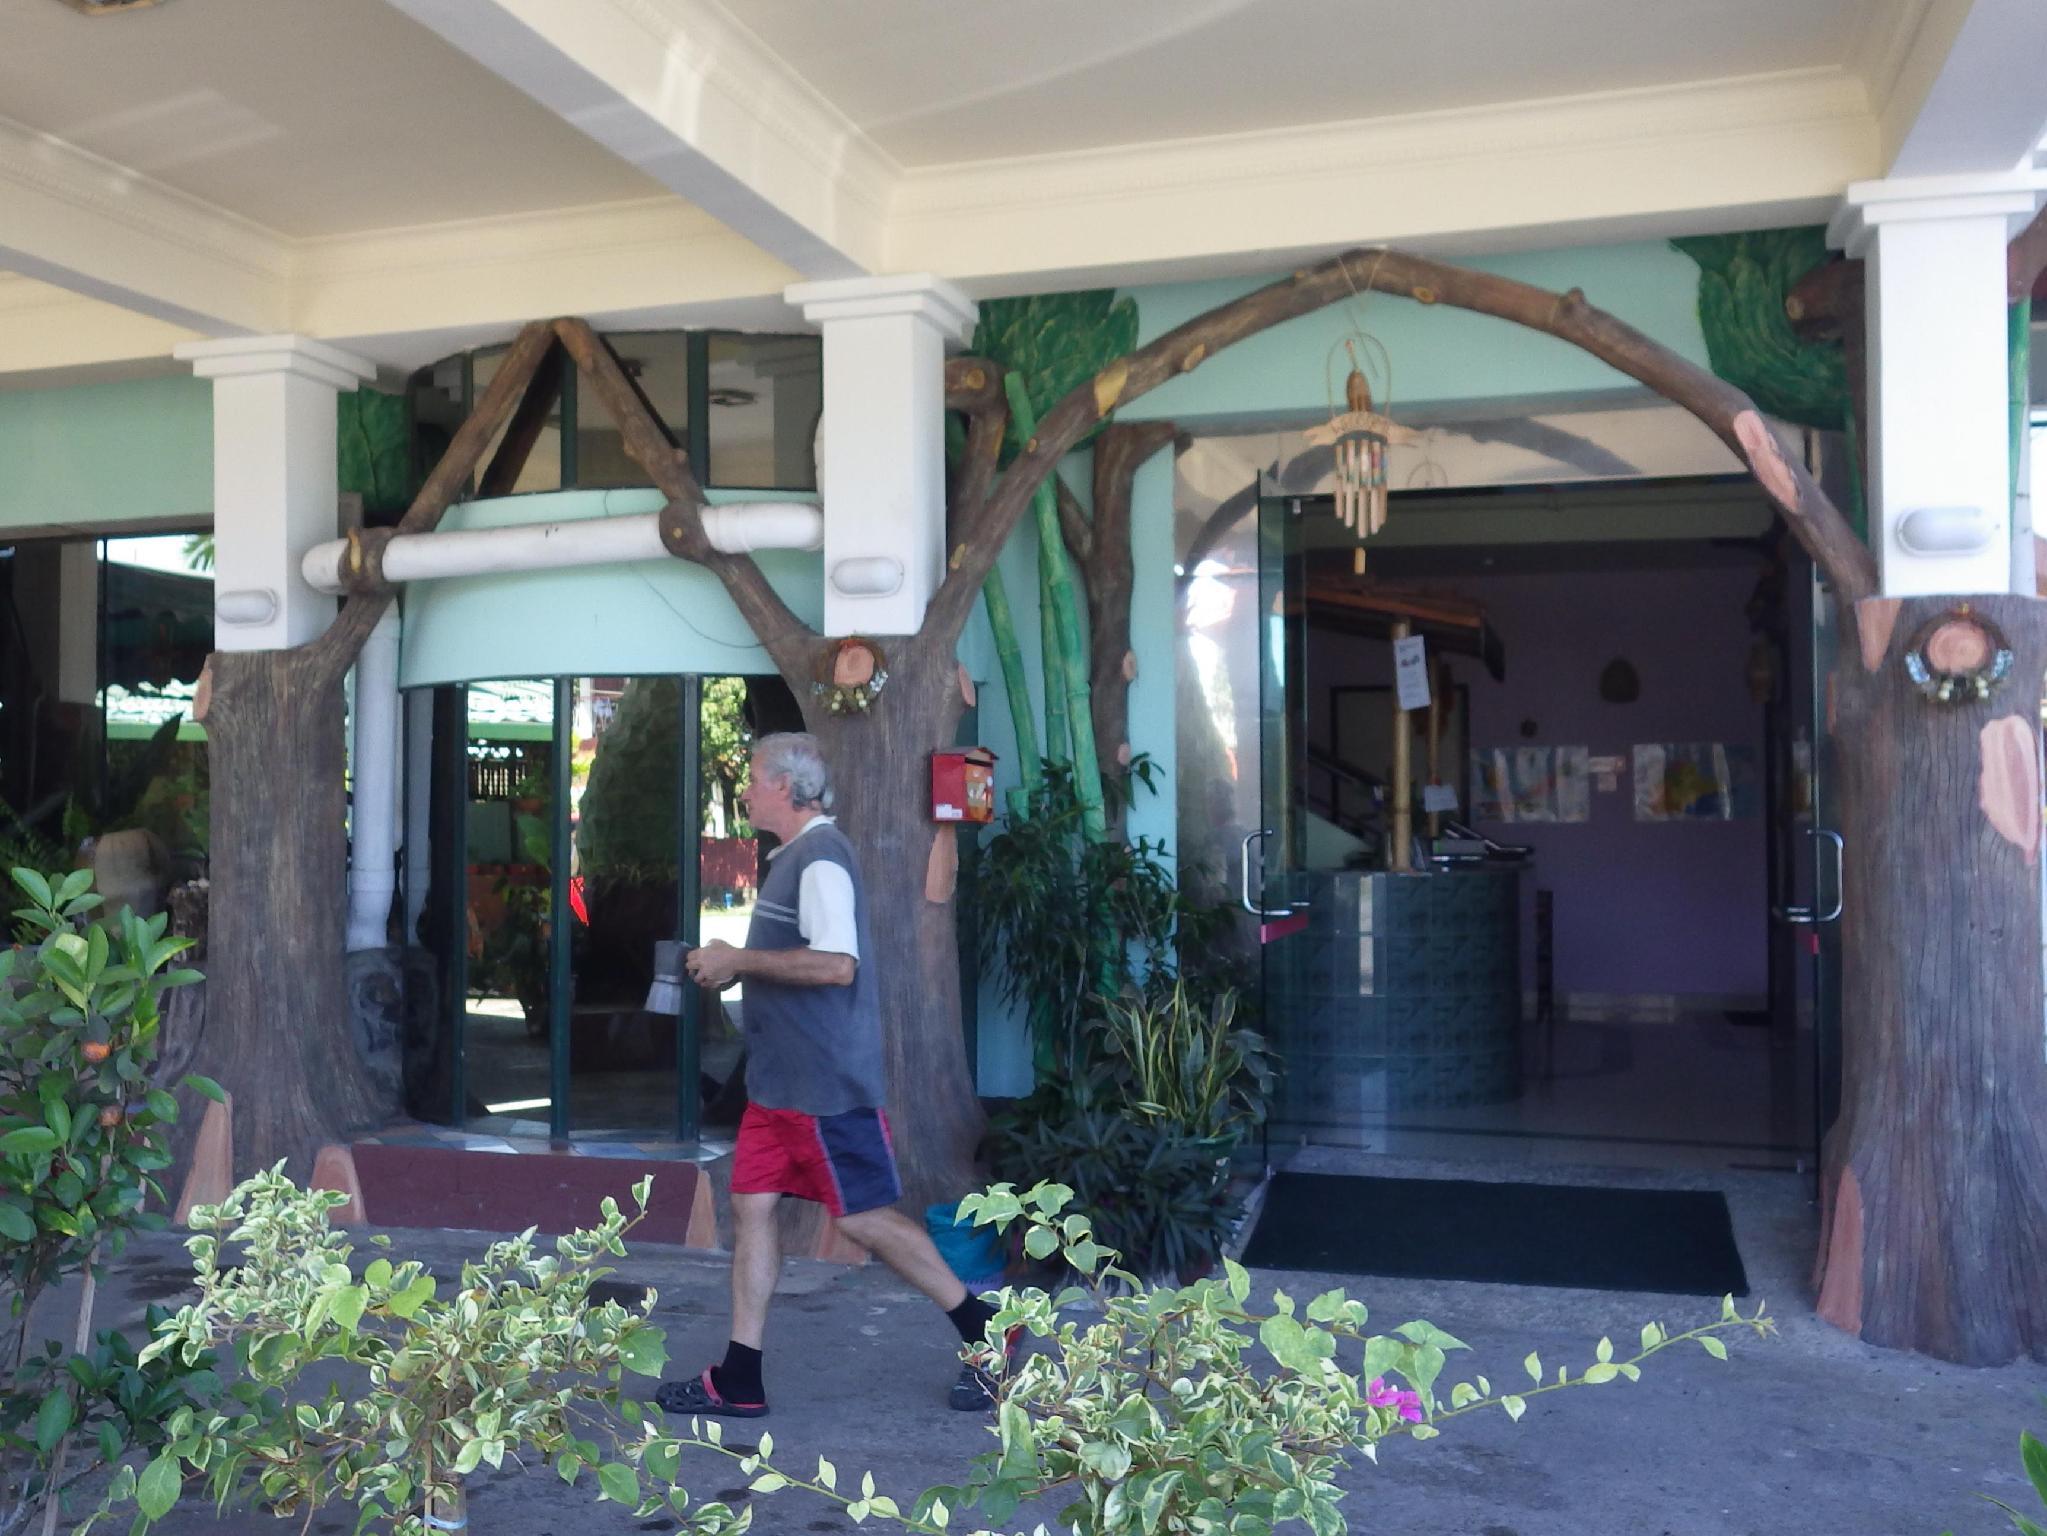 Borneo Swiss Guest House, Kota Kinabalu